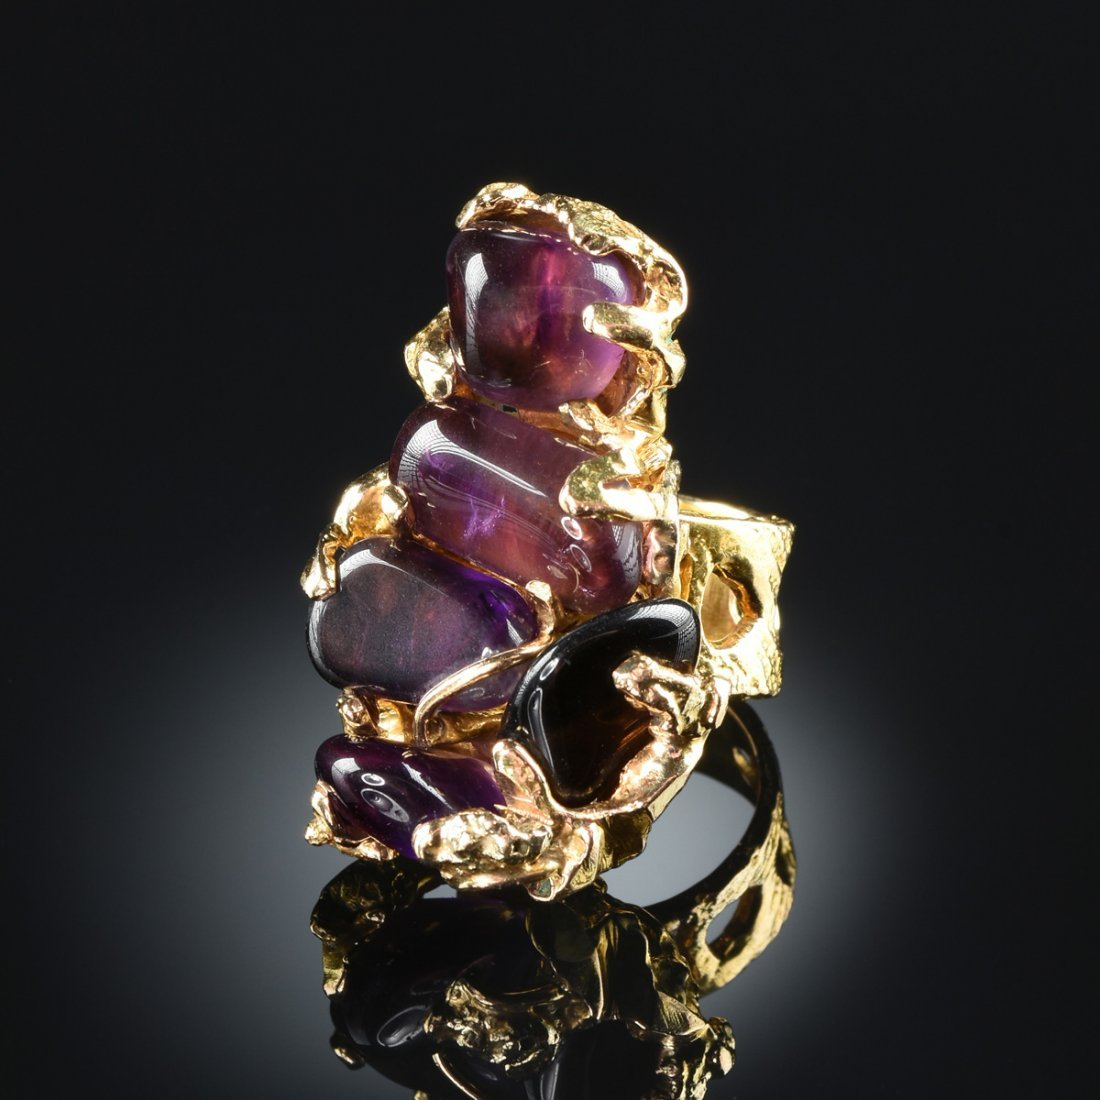 A 14K YELLOW GOLD CRAB SHAPED AMETHYST RING,